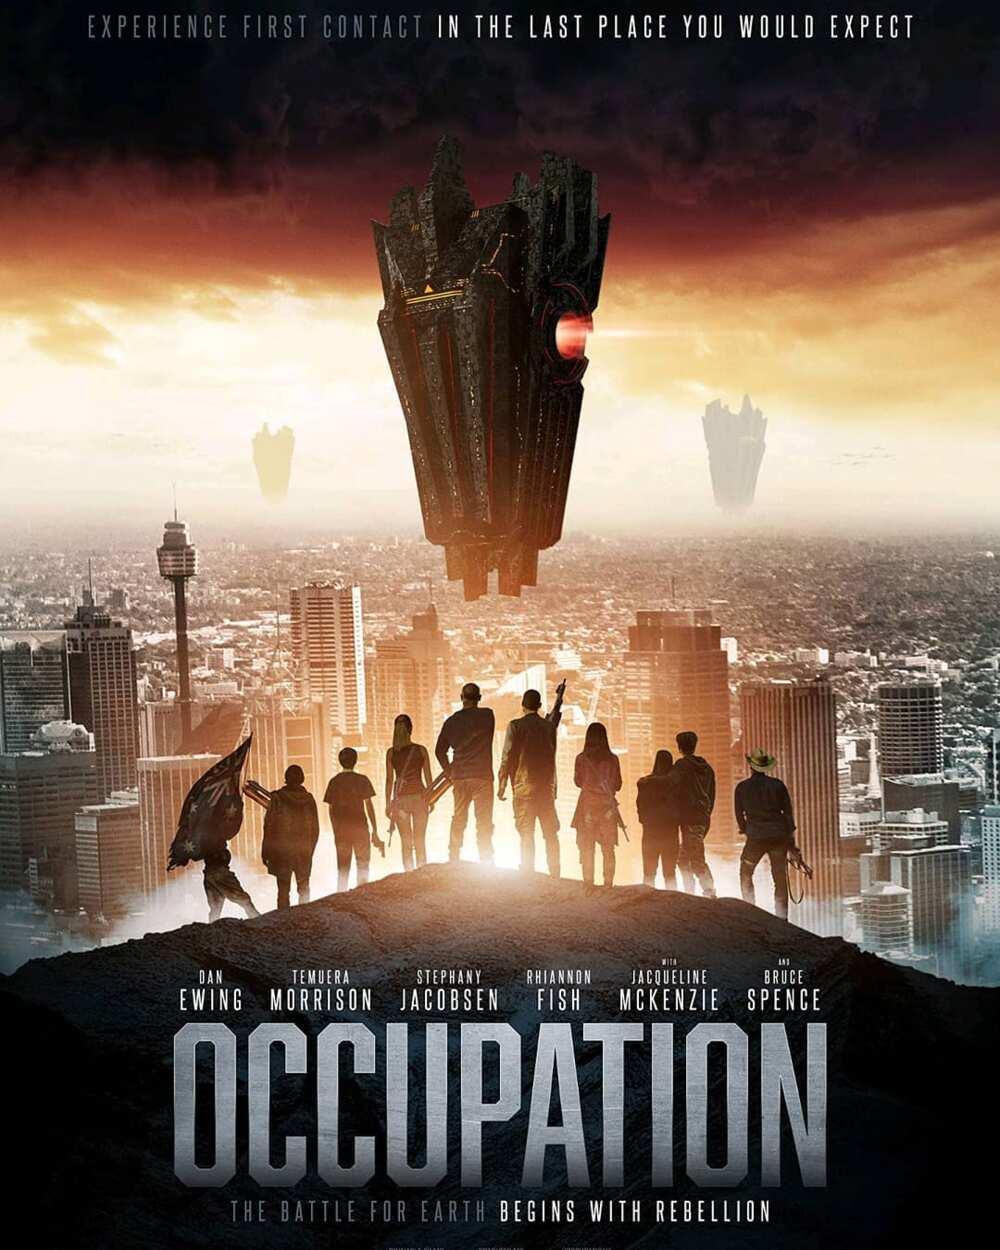 Dystopia Film